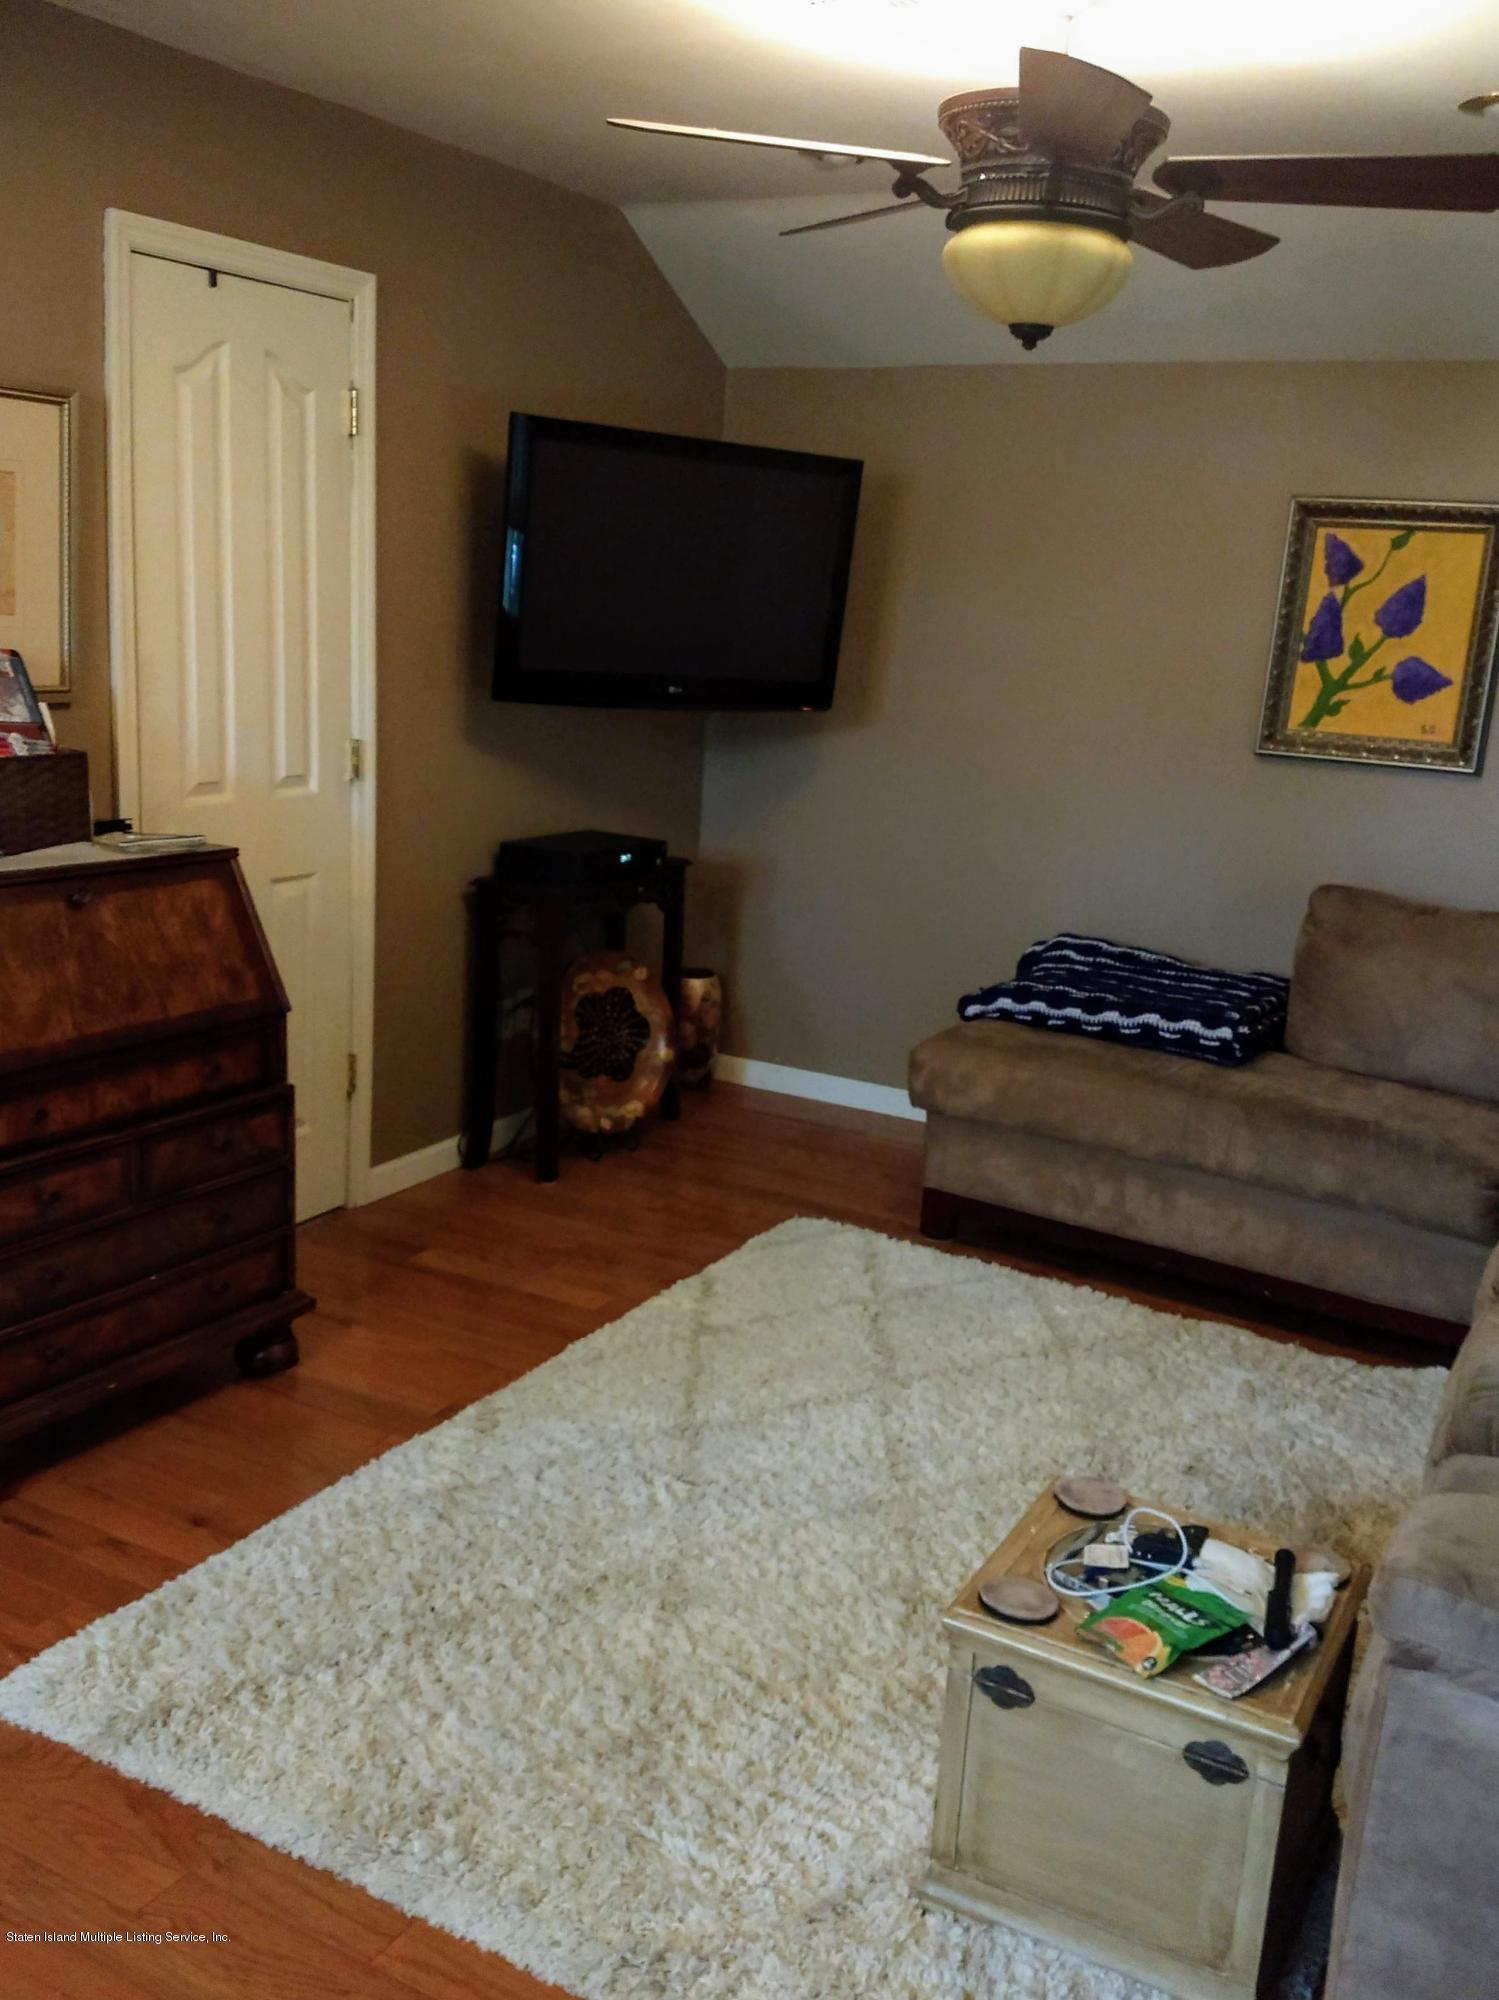 Single Family - Detached 45 Delmore Street  Staten Island, NY 10314, MLS-1128668-14